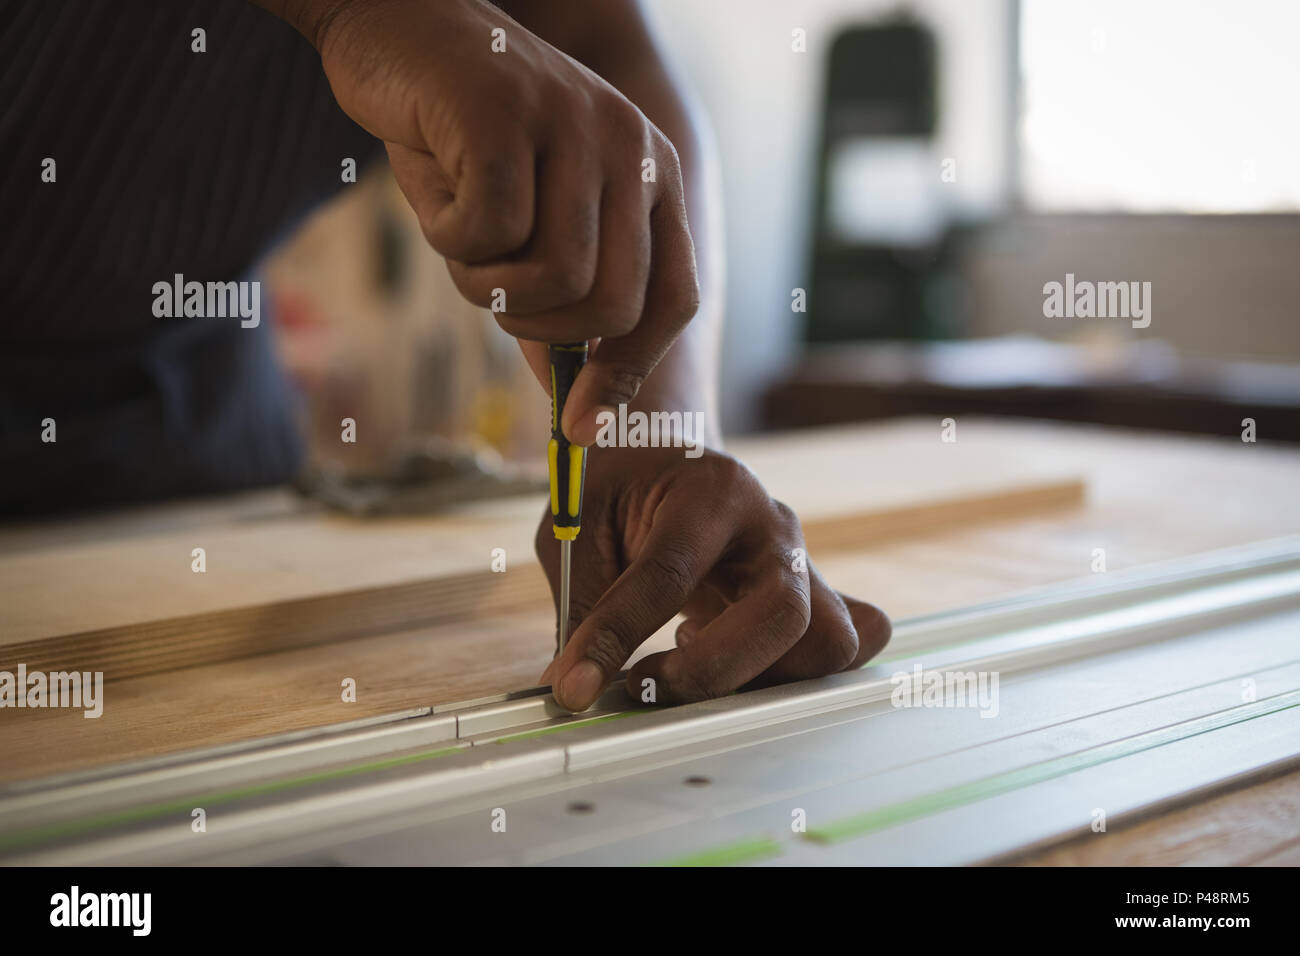 Nailing Frame Stockfotos & Nailing Frame Bilder - Alamy